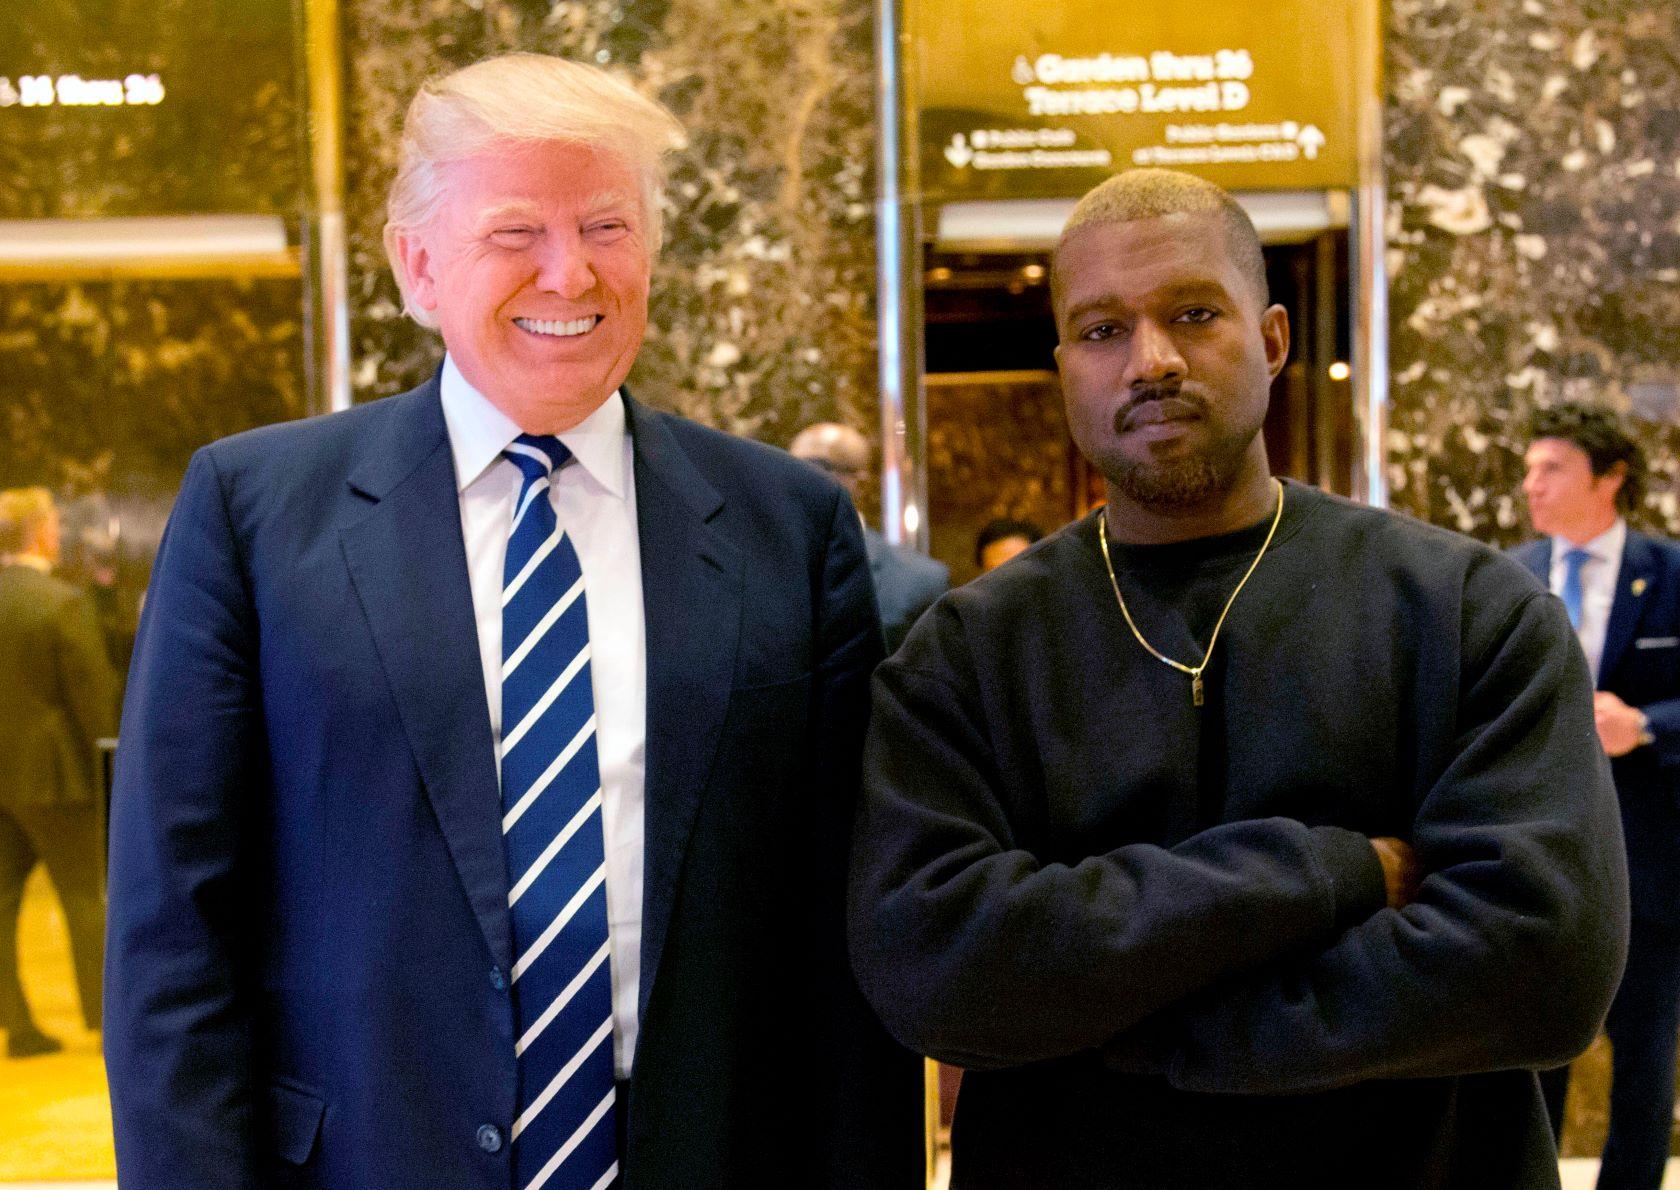 H μέρα που ο Kanye West αποφάσισε πως θέλει να κατακτήσει τον κόσμο…